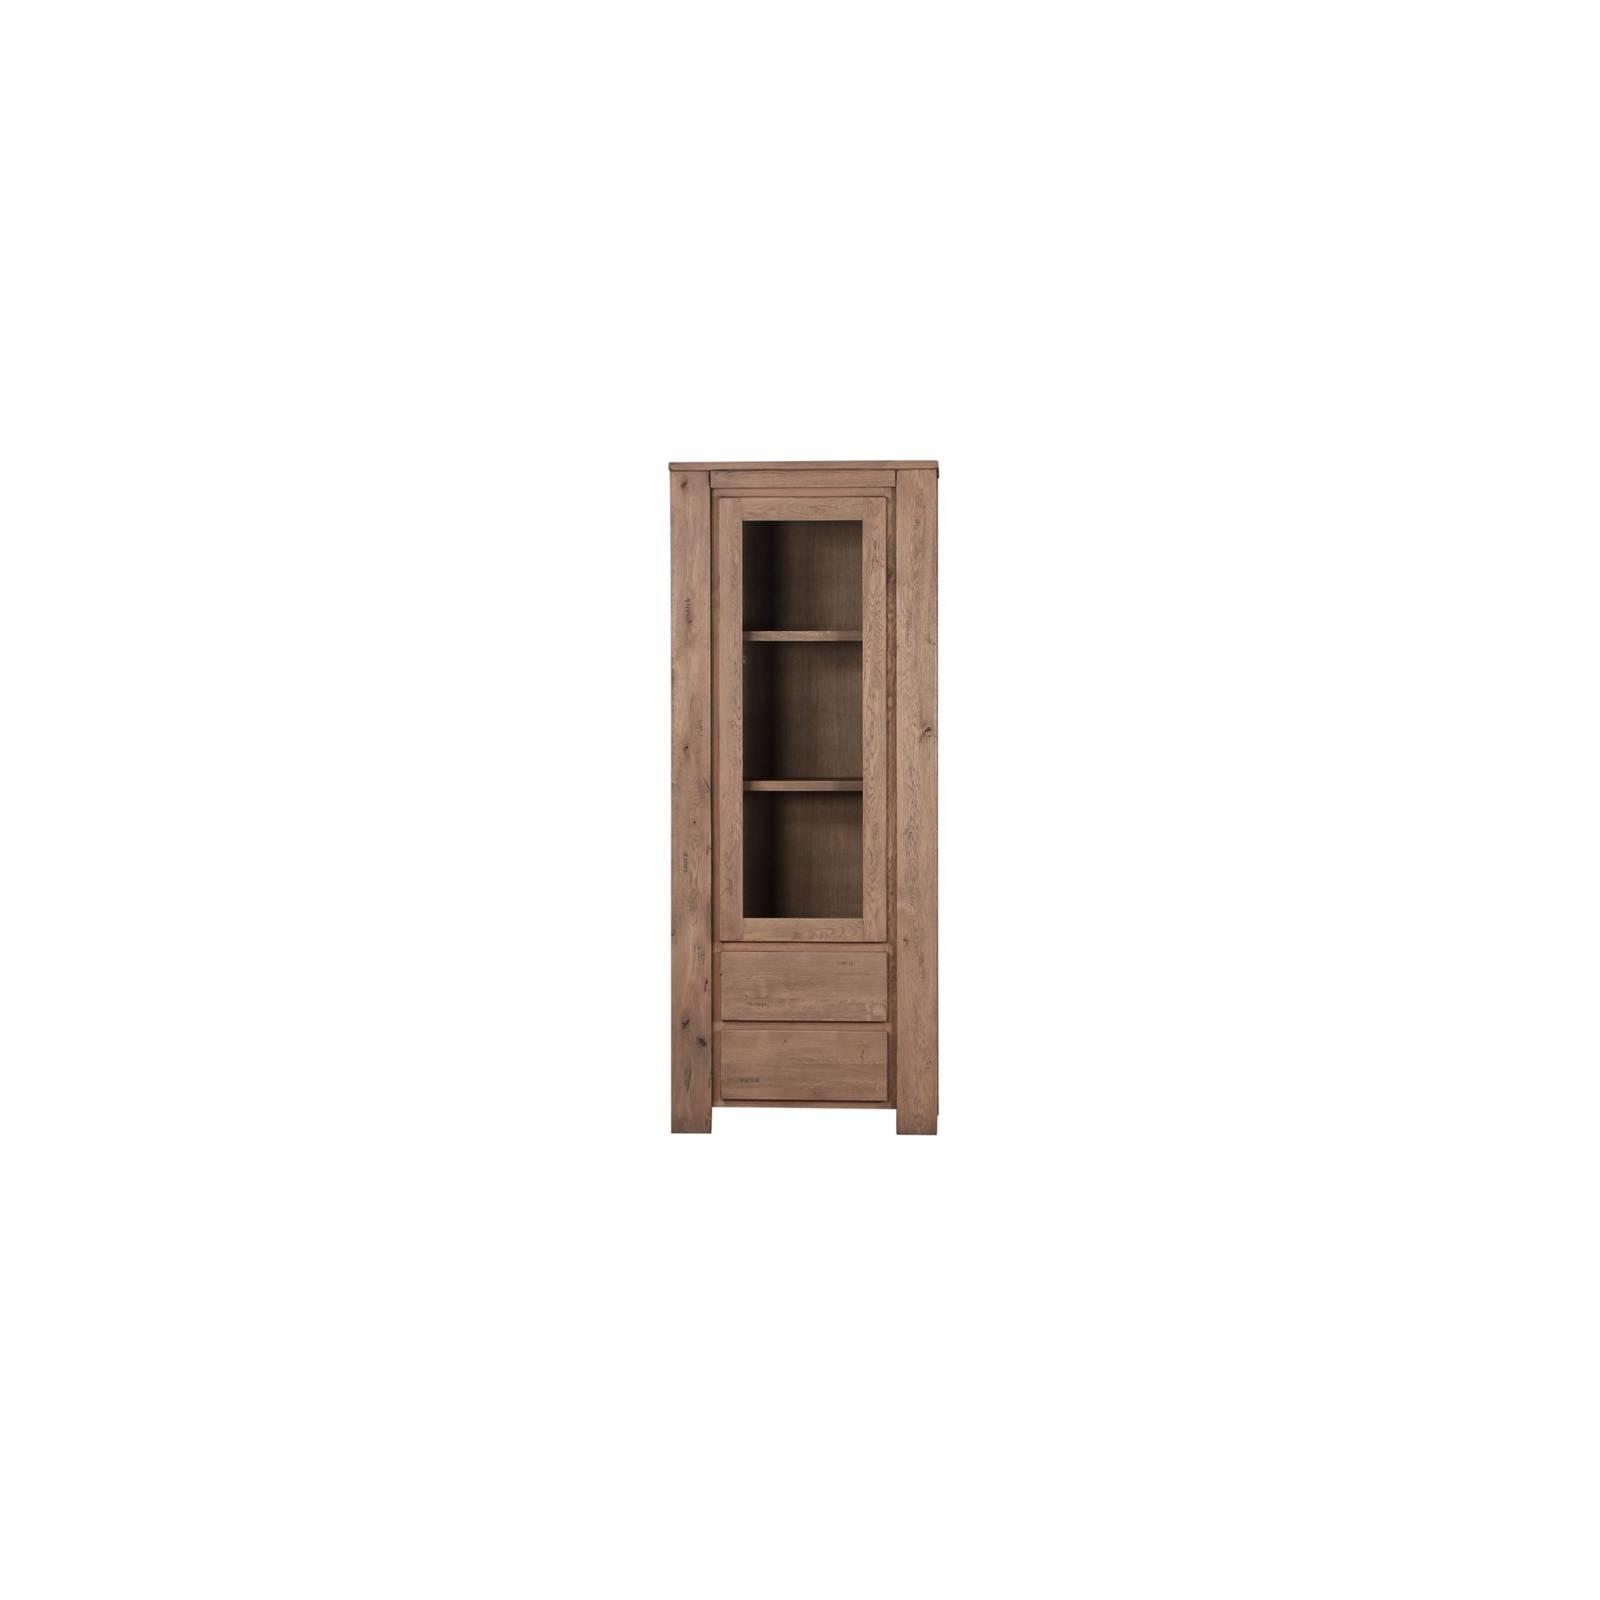 Bibliothèque Vitrée Milena Bruna Chêne - meuble style design